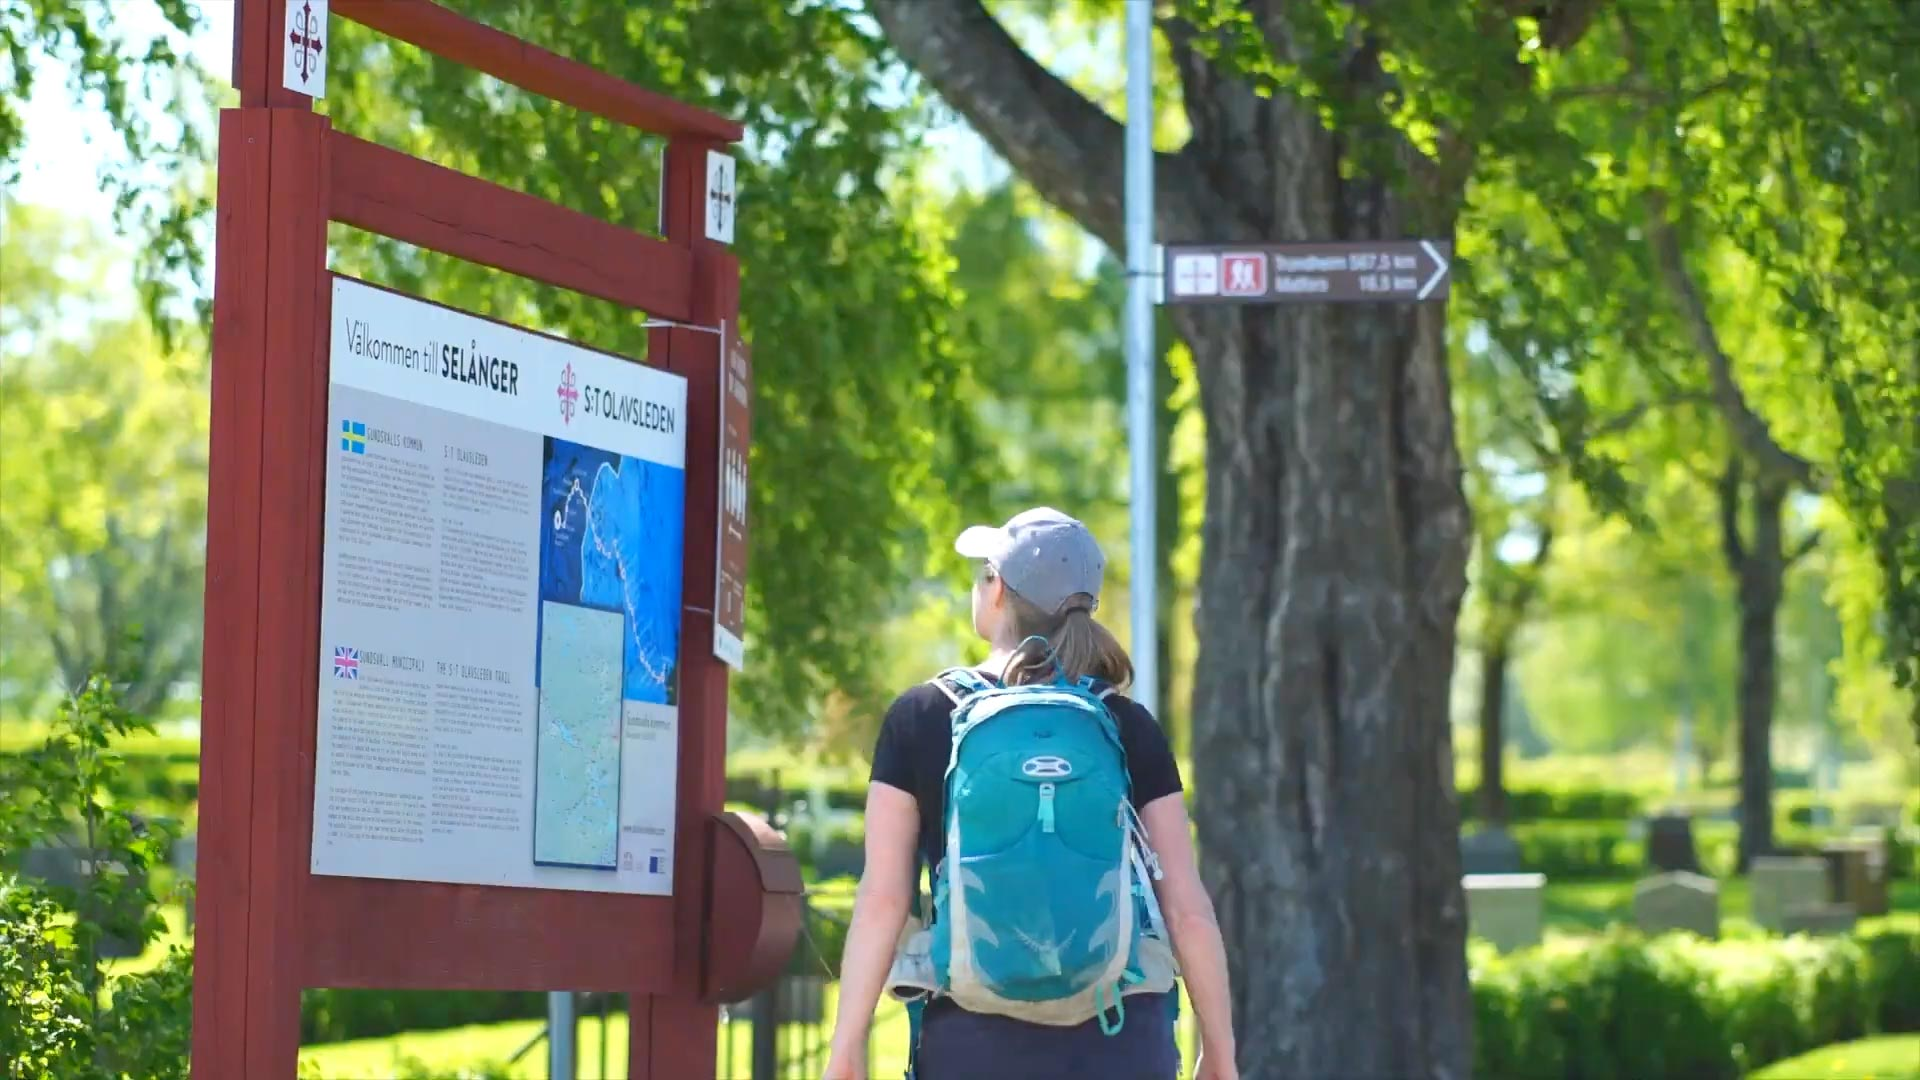 Selånger - where the trail starts